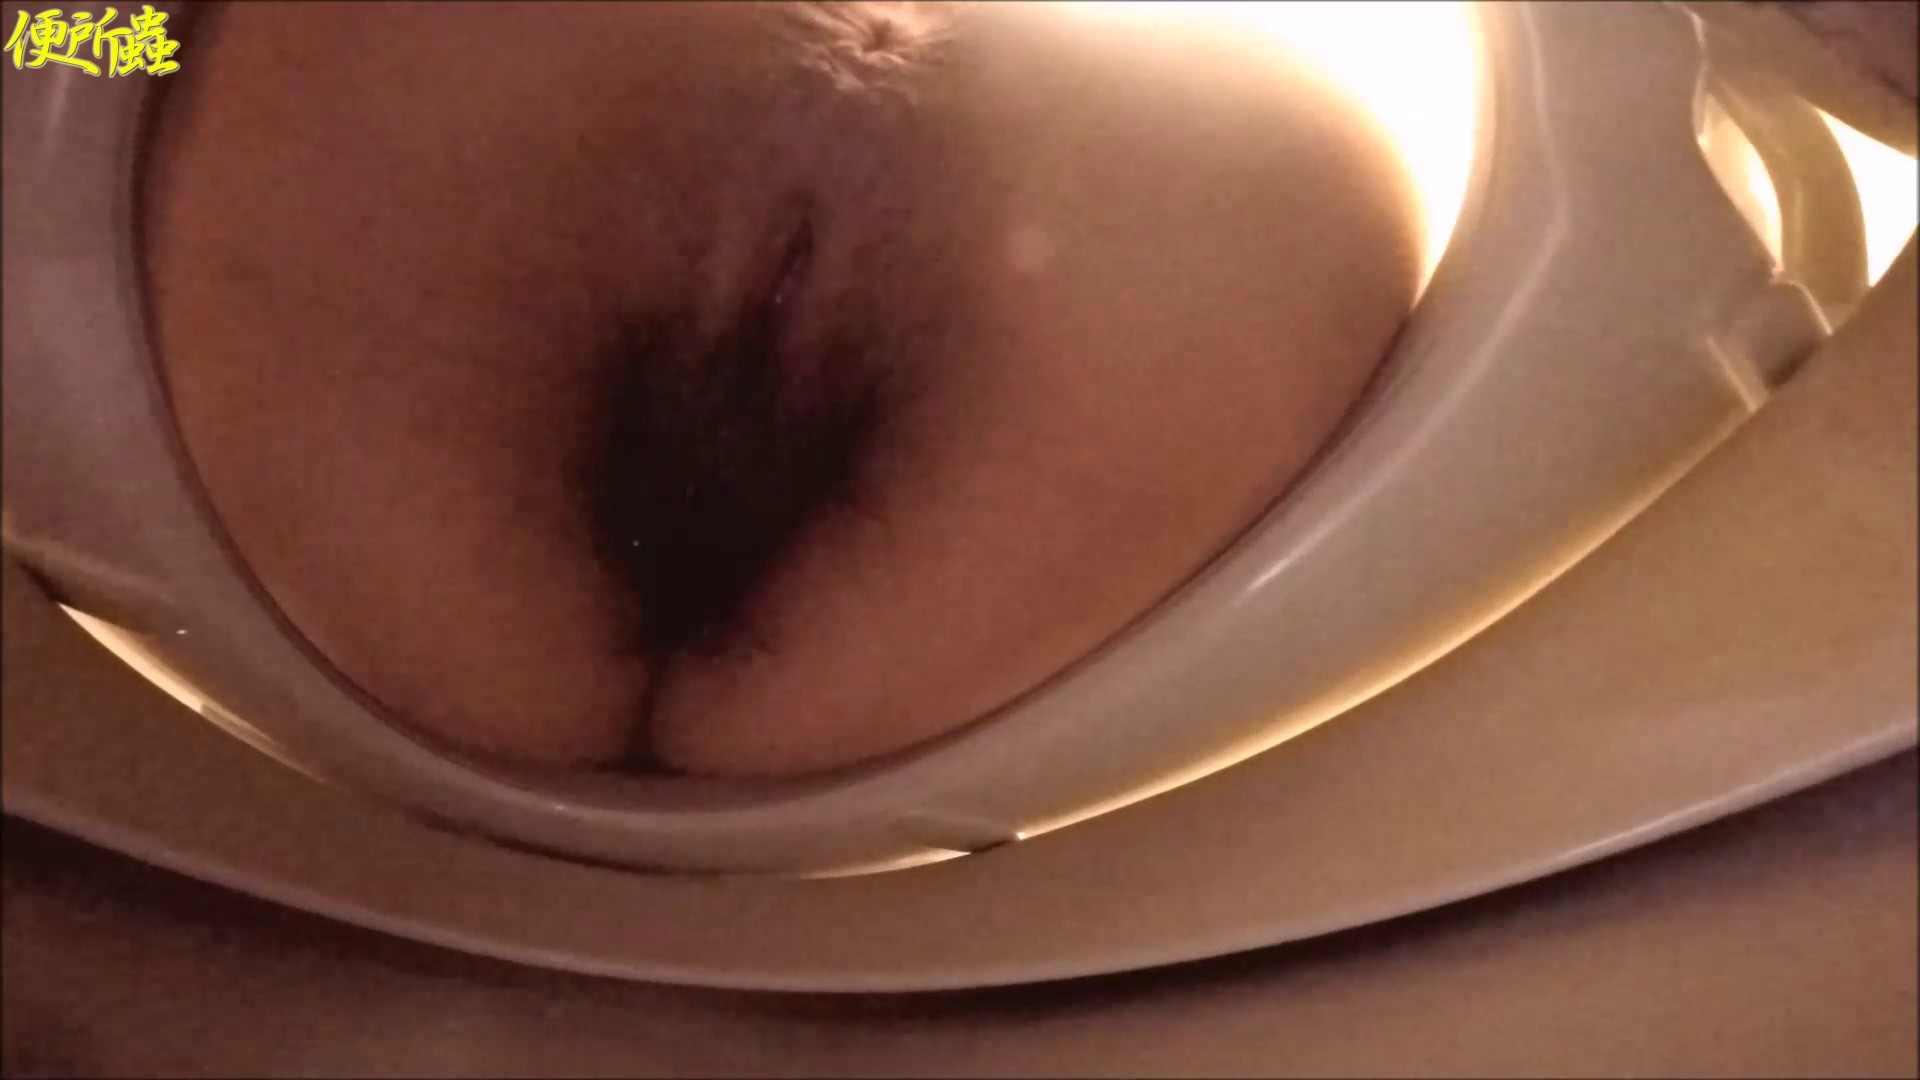 vol.13 便所蟲さんのリターン~寺子屋洗面所盗撮~ 盛合せ セックス画像 92画像 4